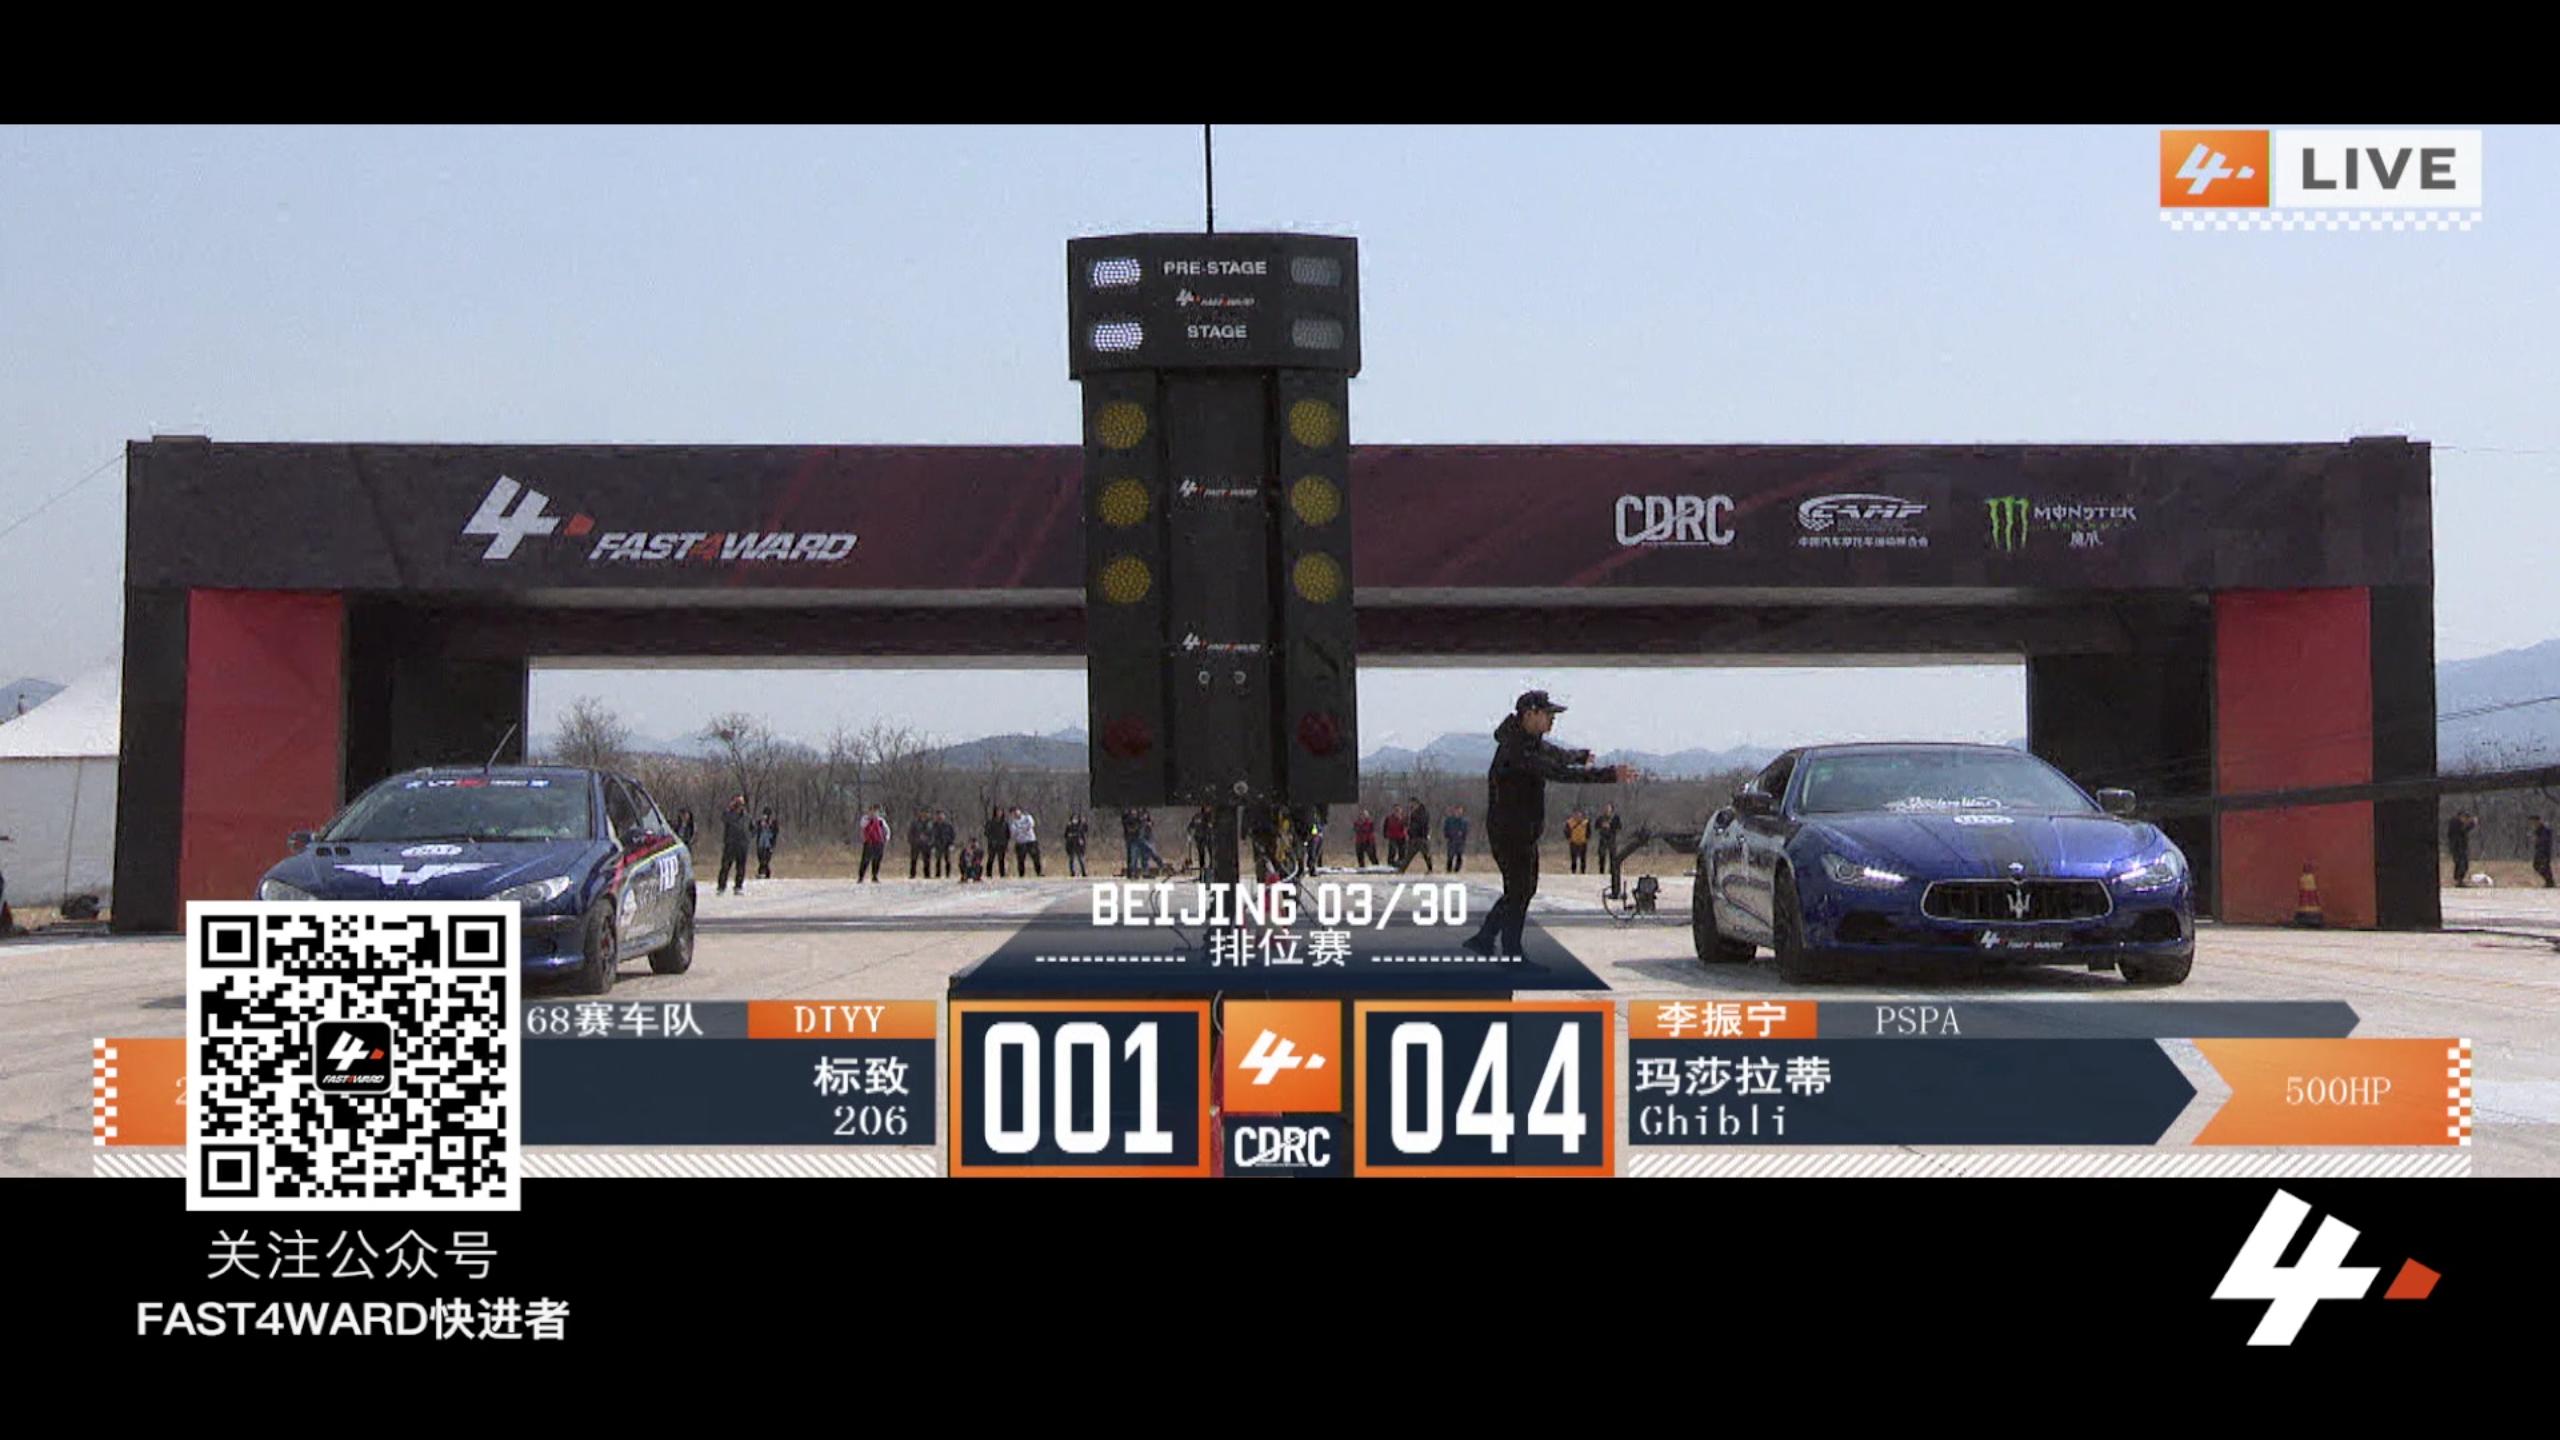 FAST4WARD  北京站 标志206 vs 玛莎拉蒂 ghibli